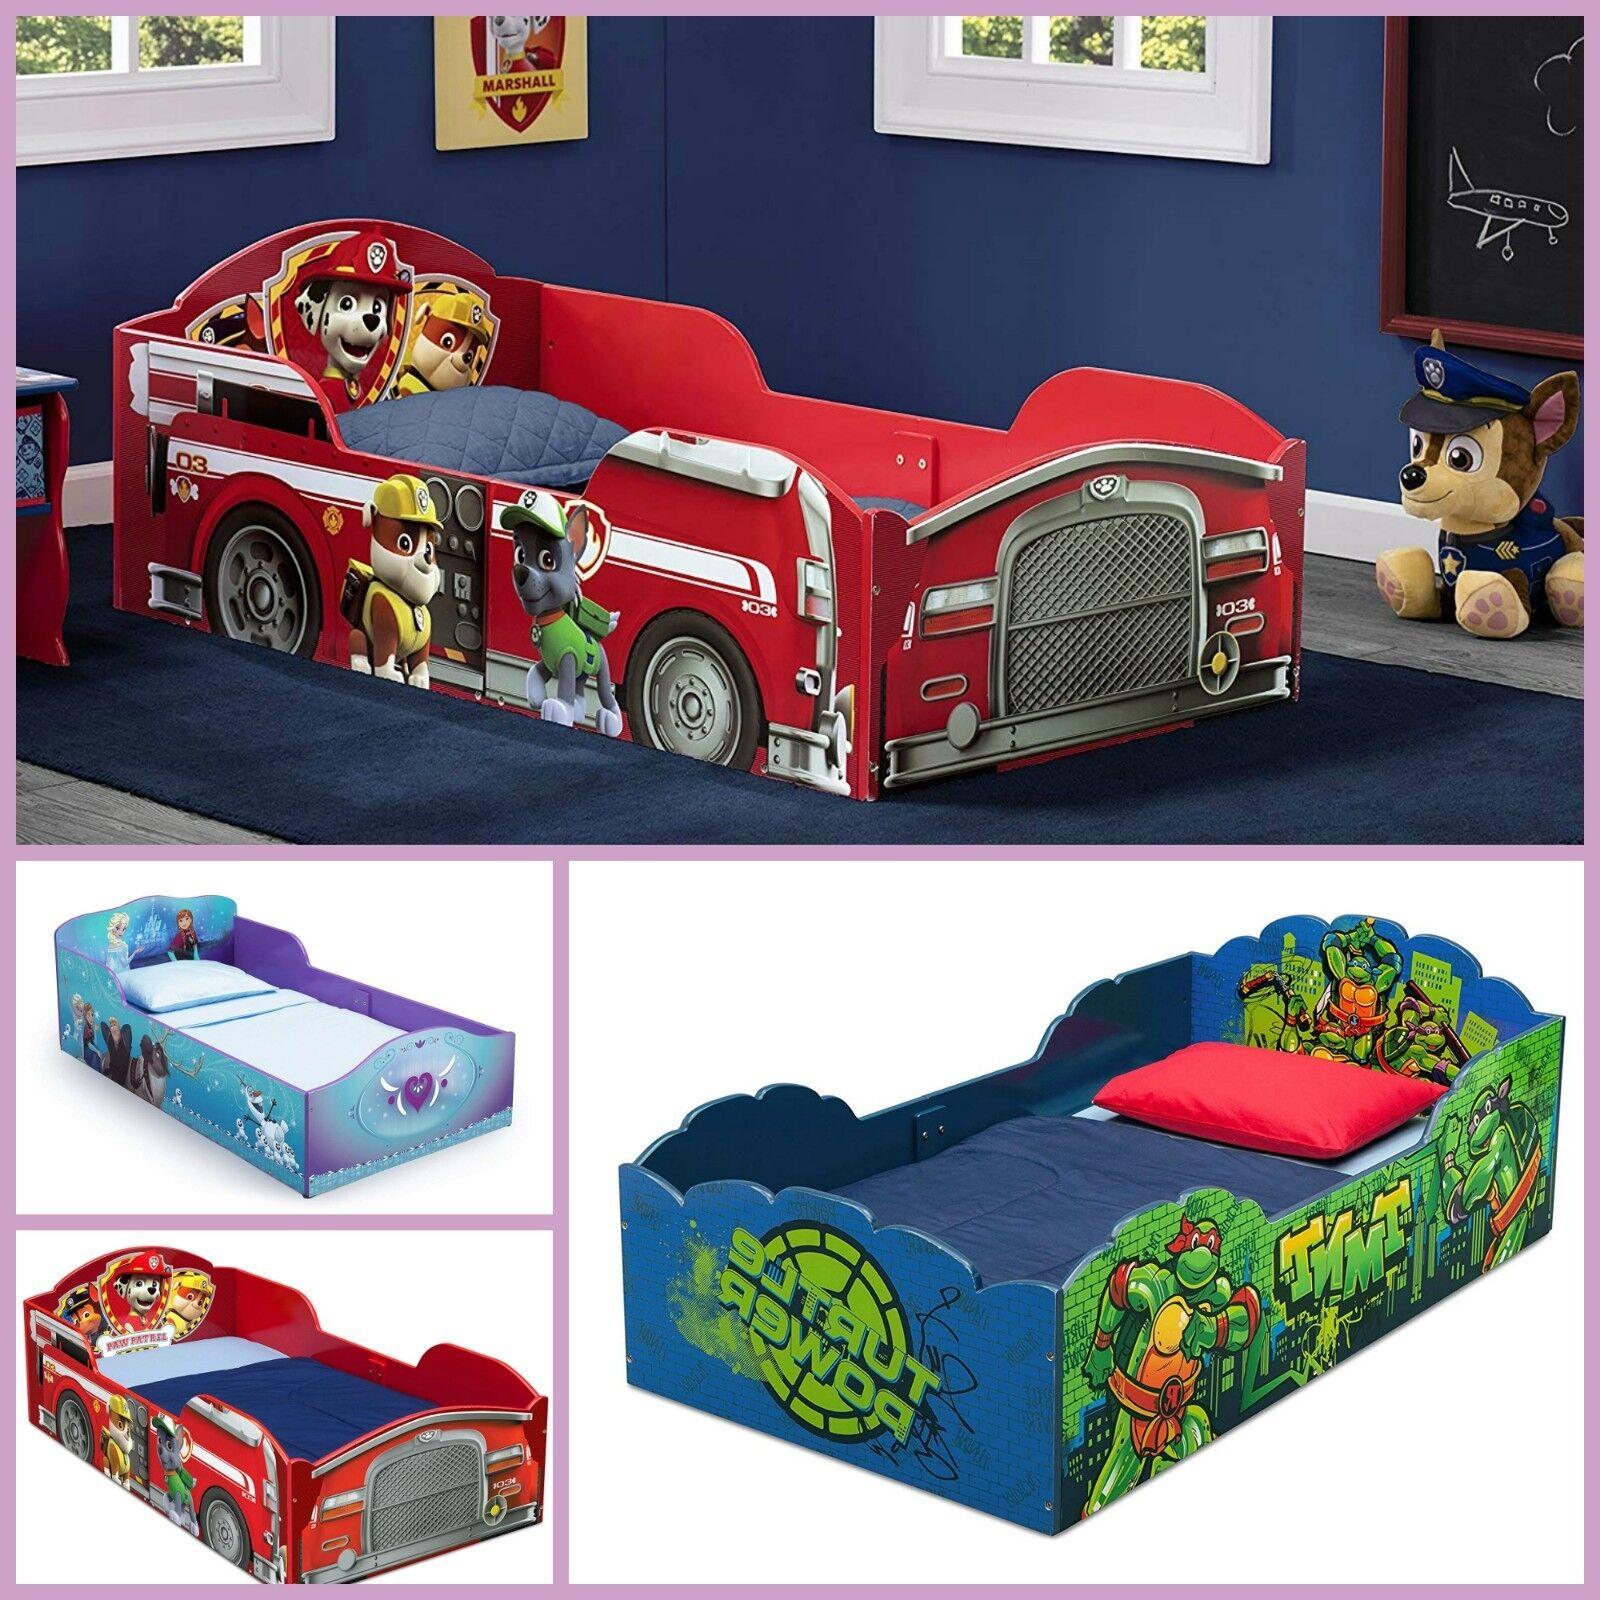 Wood Toddler Bed Mattress Kids Bedroom Furniture Disney Cars